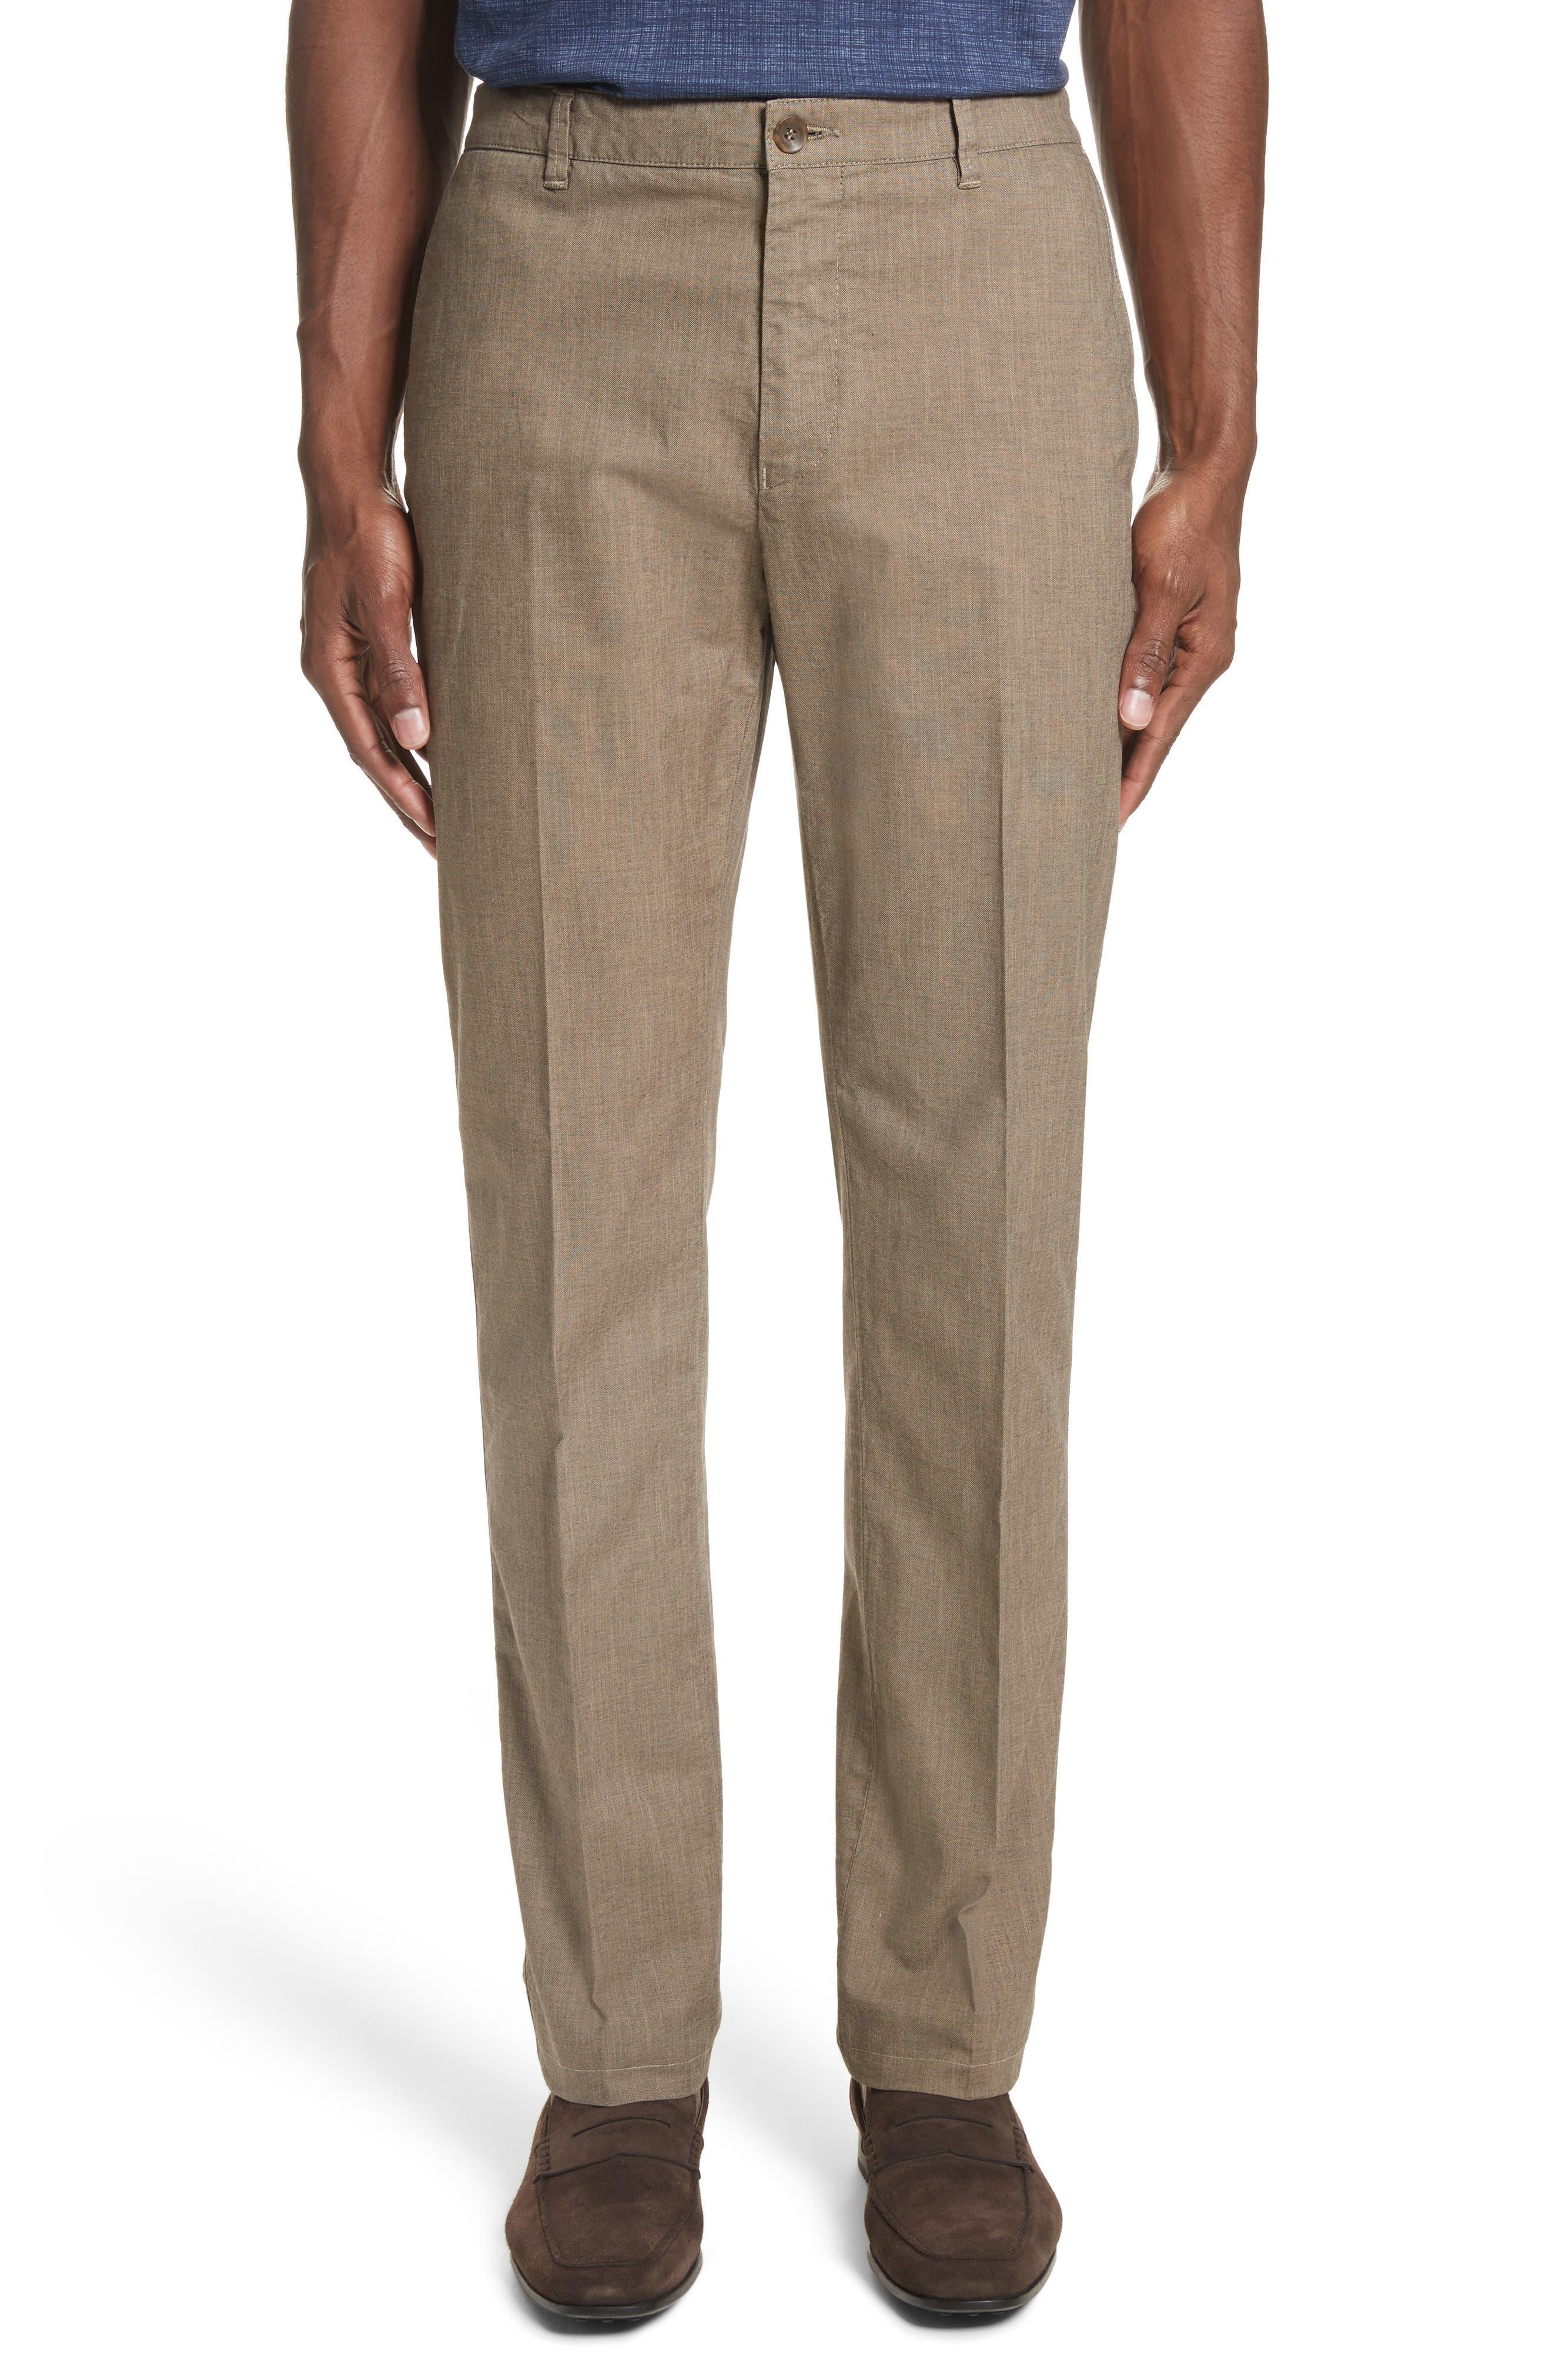 French Pocket Stretch Straight Leg Pants,                         Main,                         color, Dark Beige